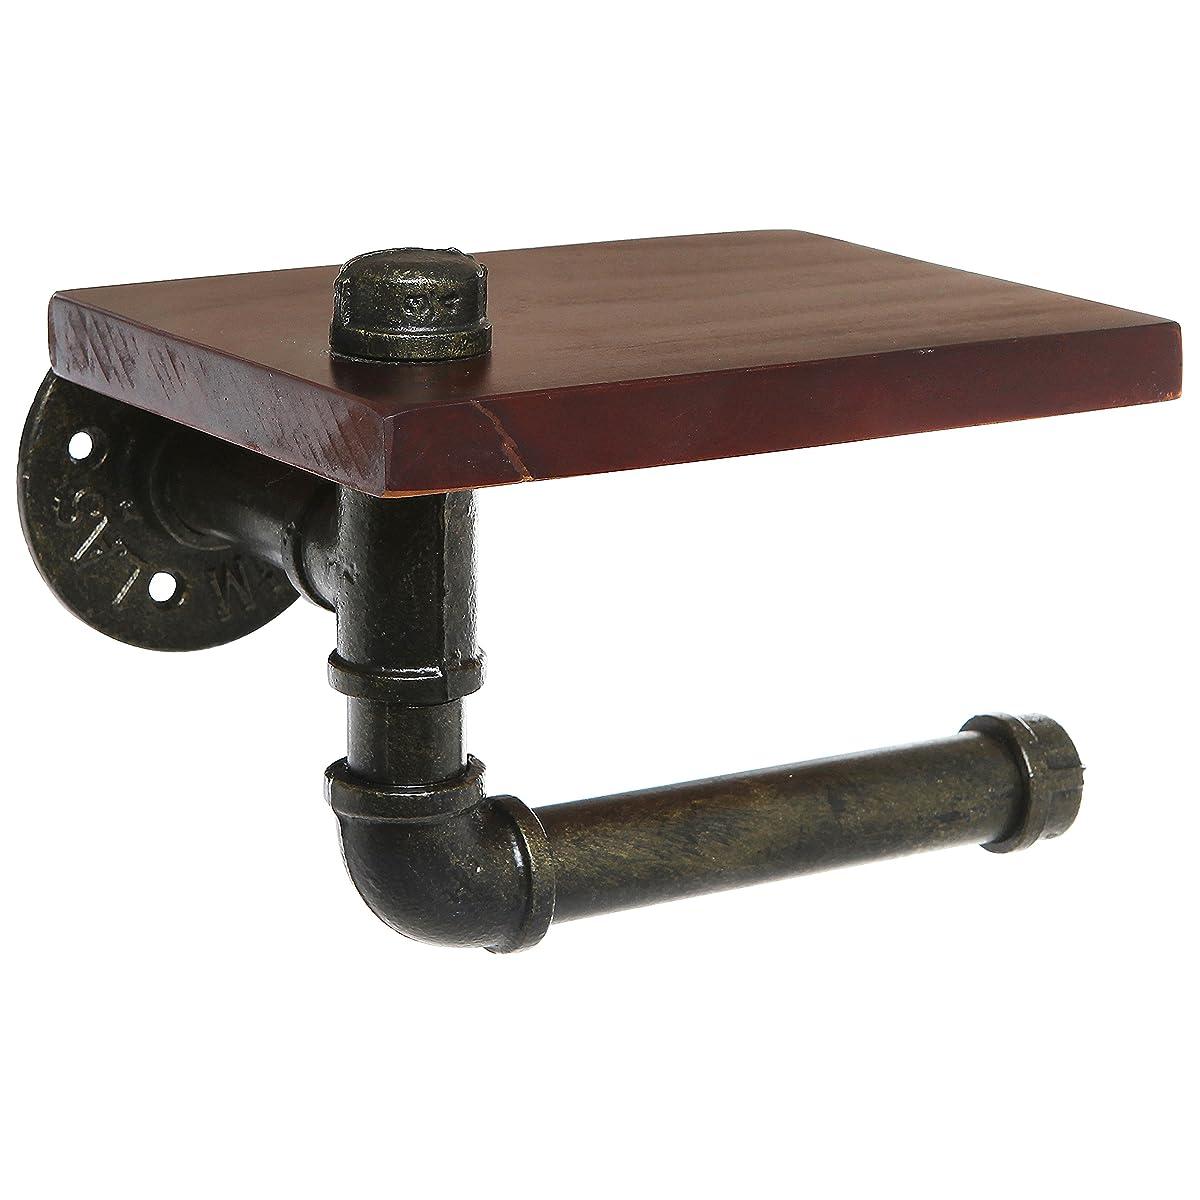 Rustic Style Pipe Design Brown Wood & Black Metal Wall Mounted Bathroom Shelf / Toilet Paper Roll Holder